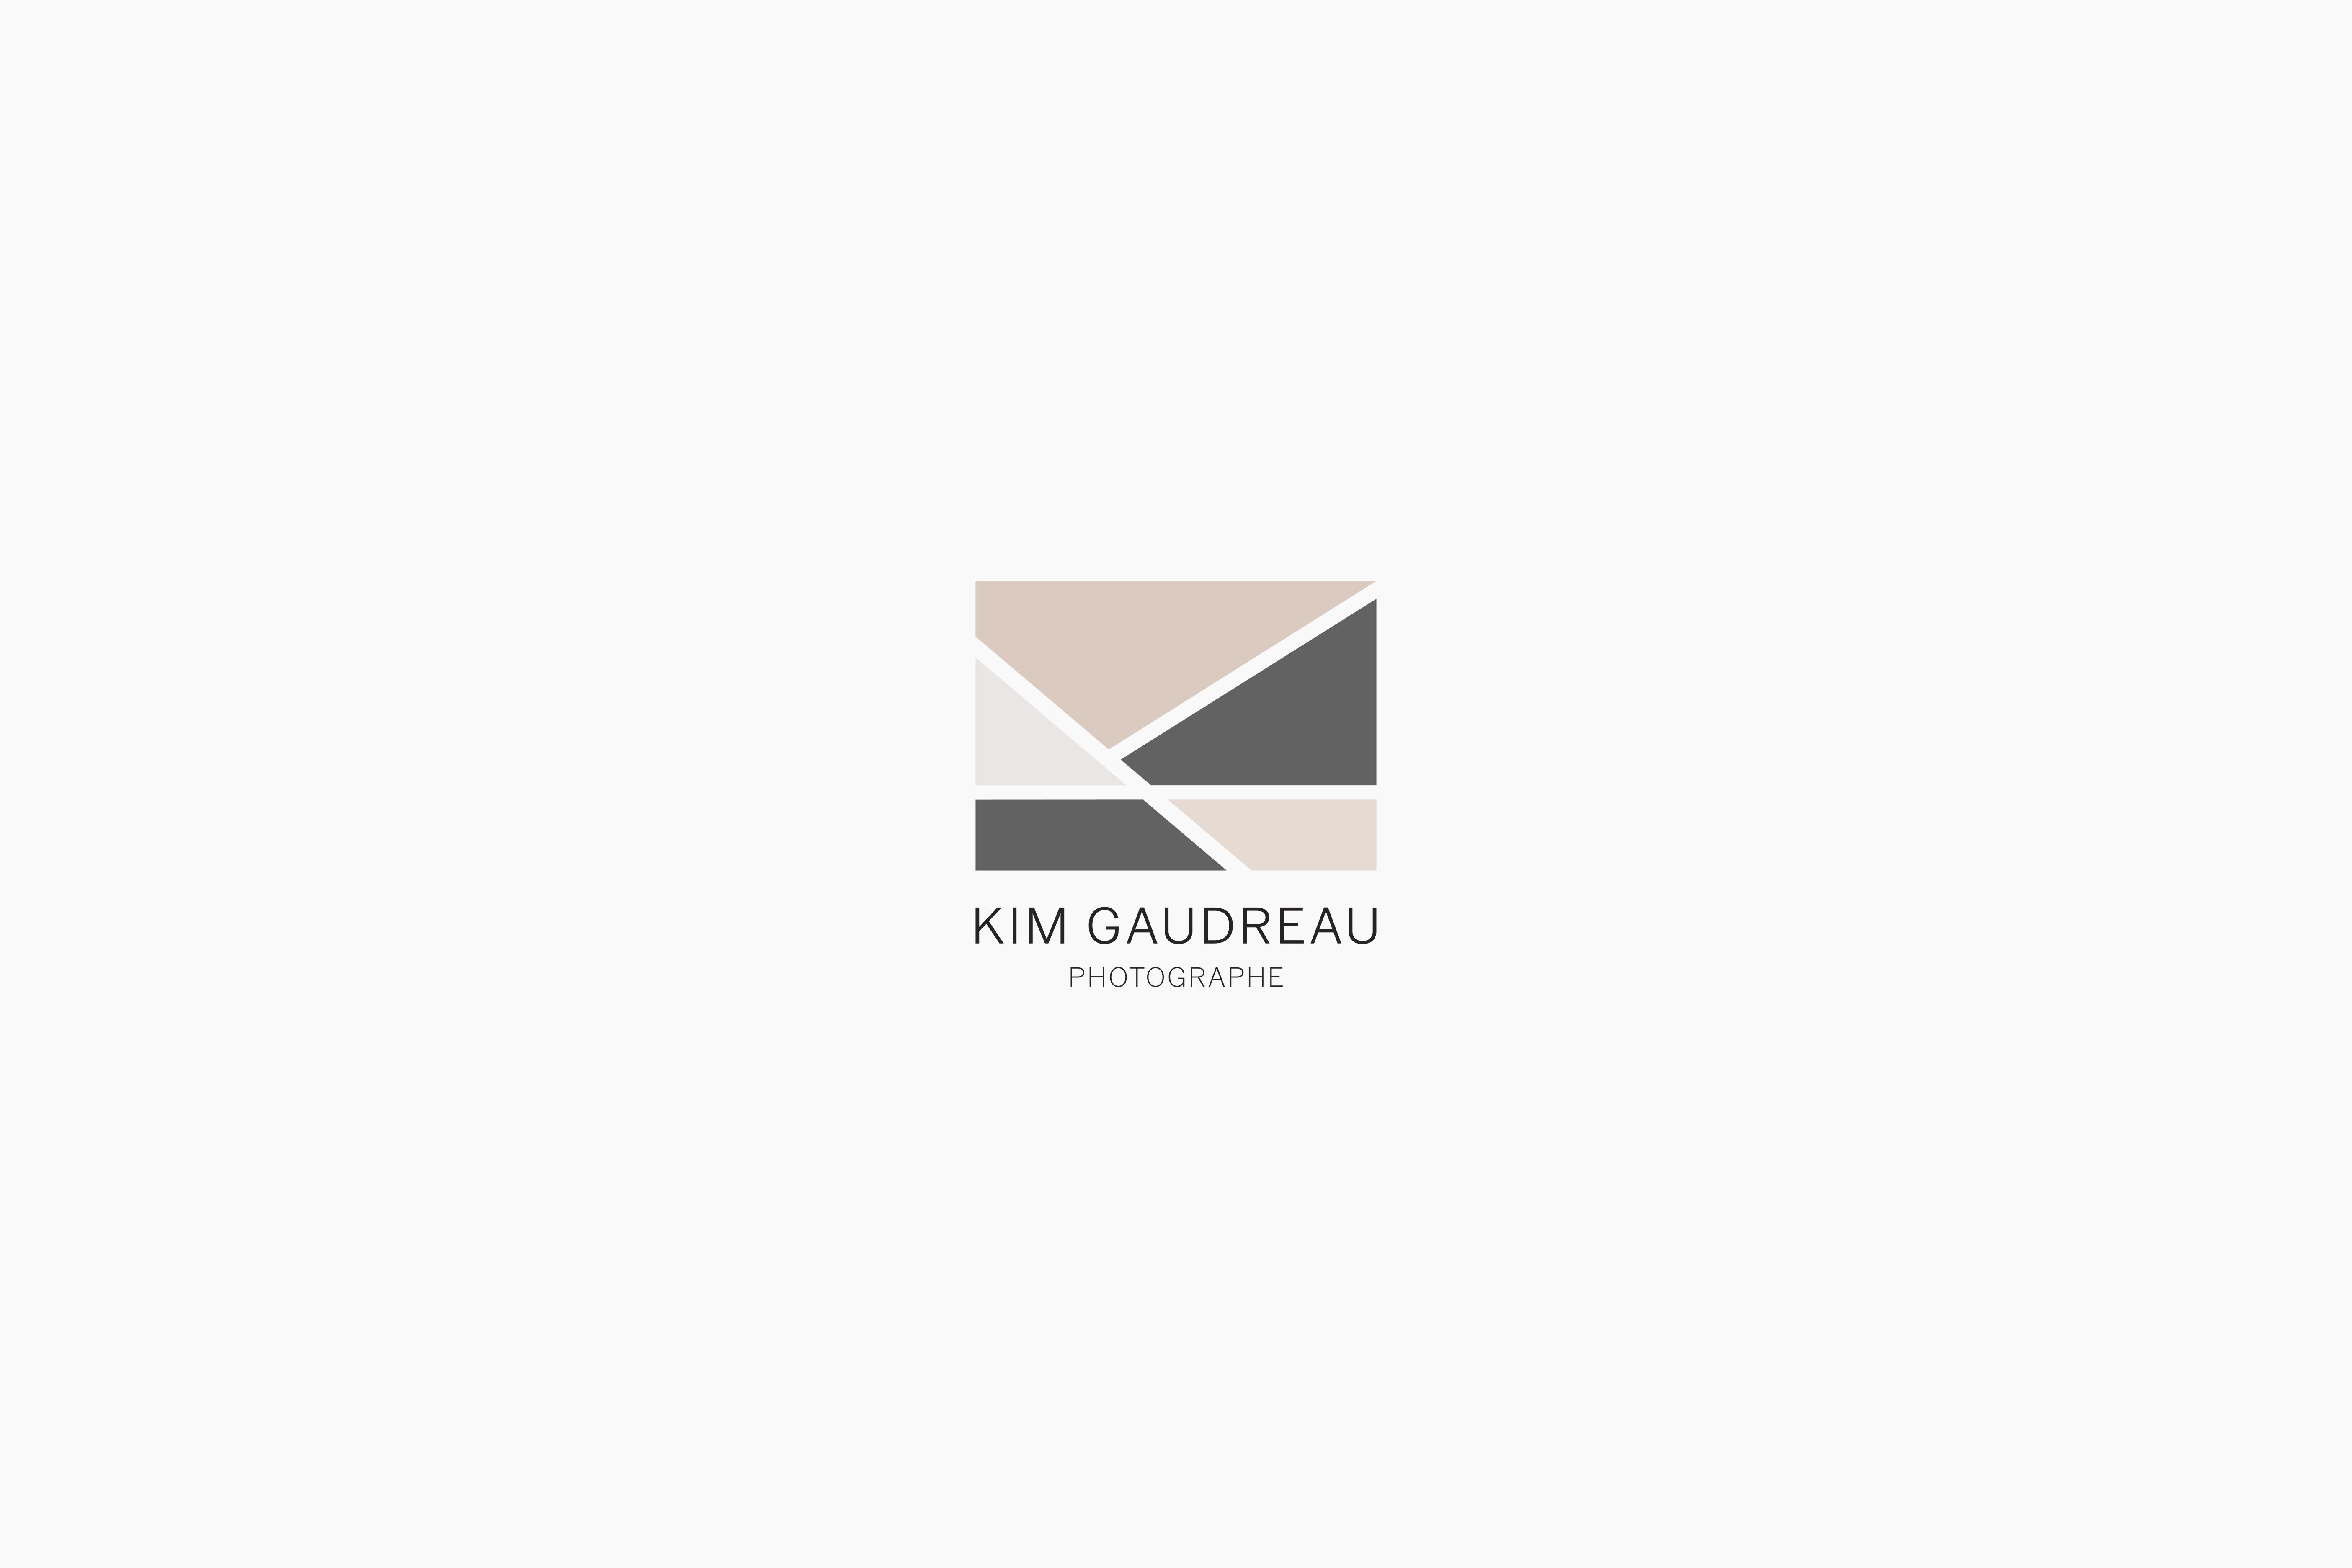 Kim Gaudreau Photographe